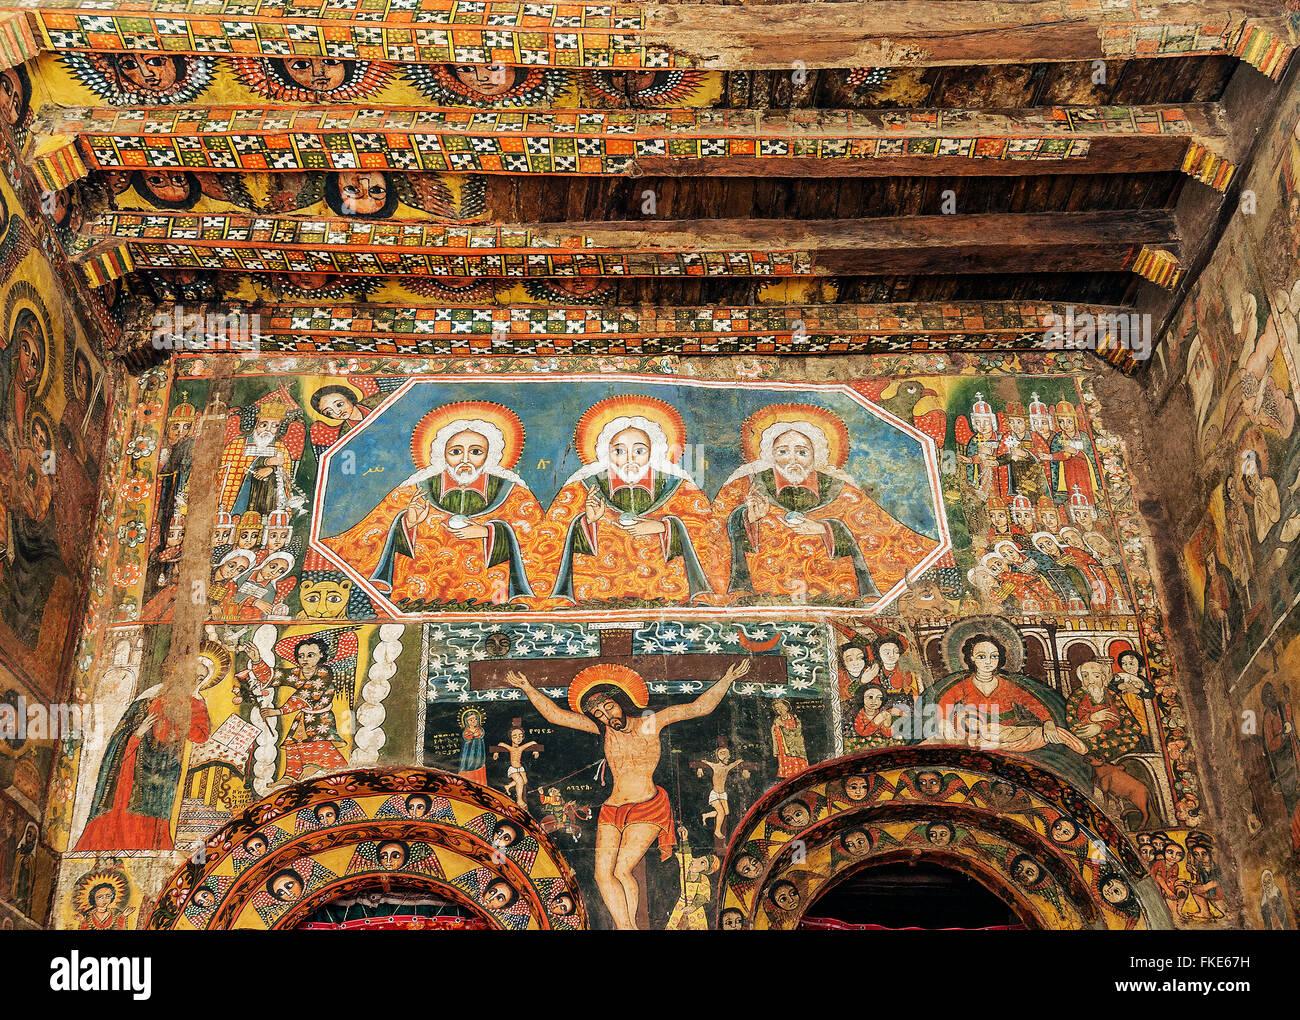 ancient ethiopian orthodox church interior painted walls in gondar ethiopia - Stock Image